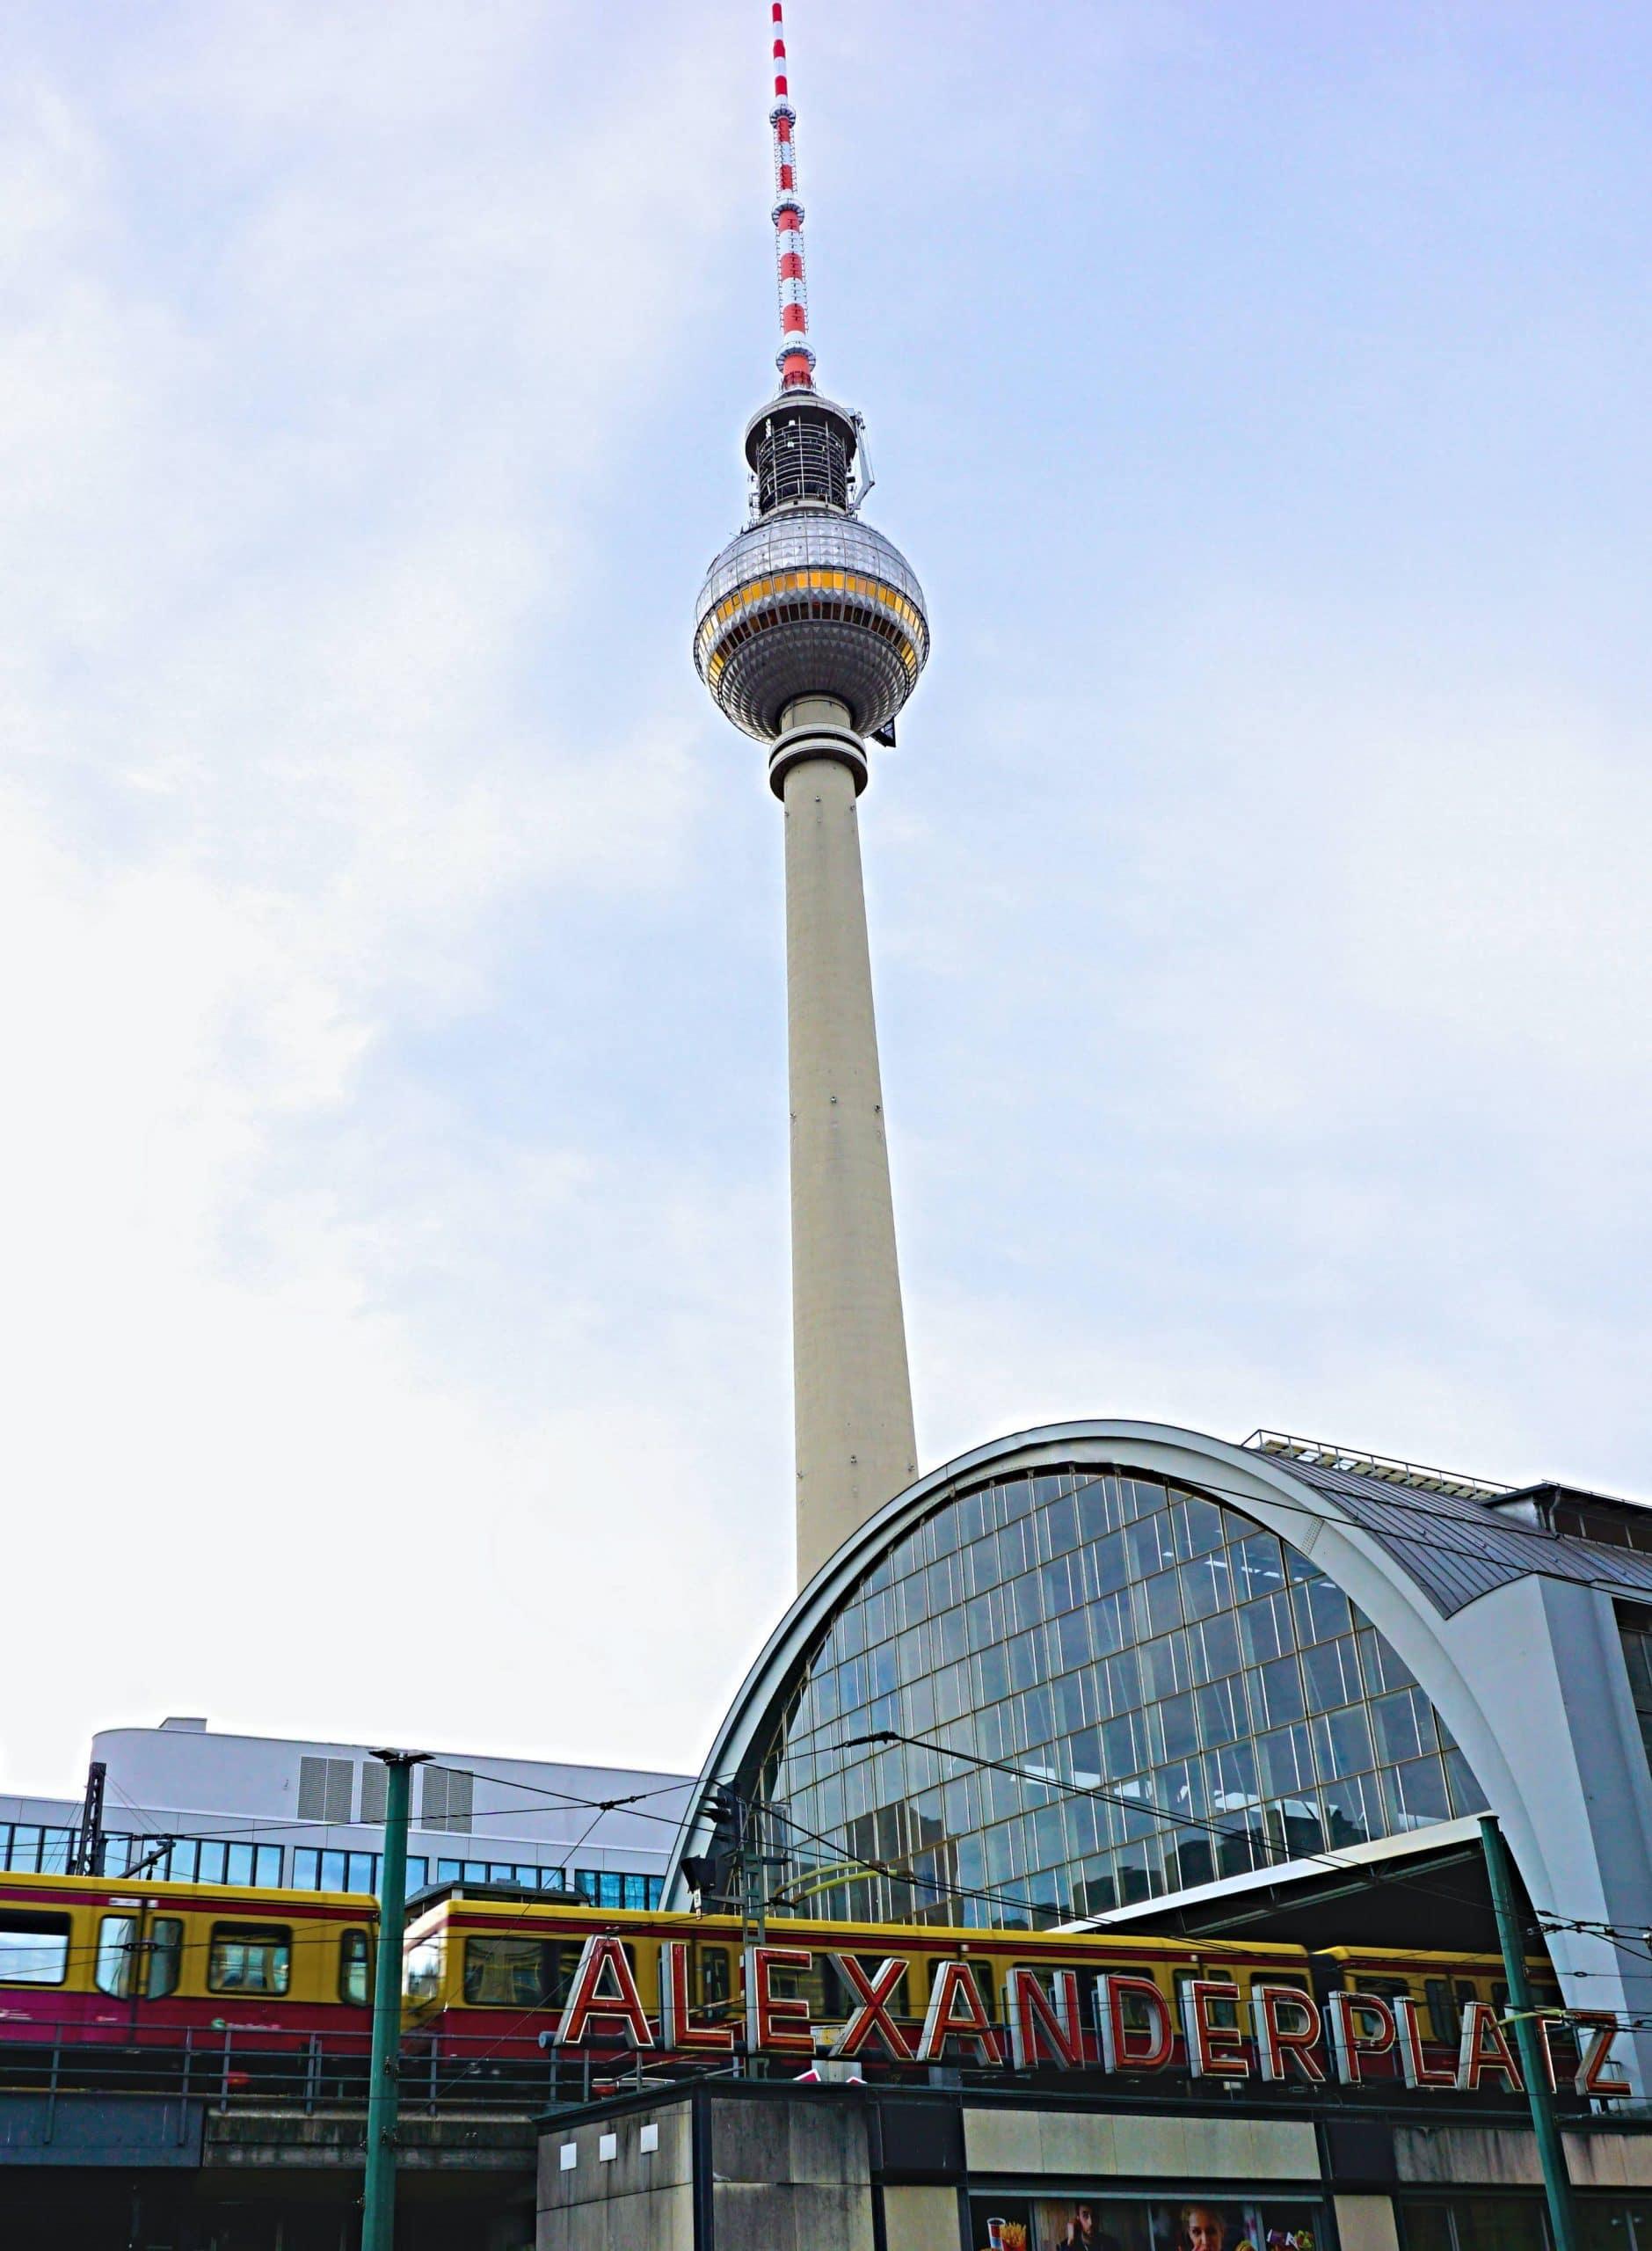 tour de Fersehturm